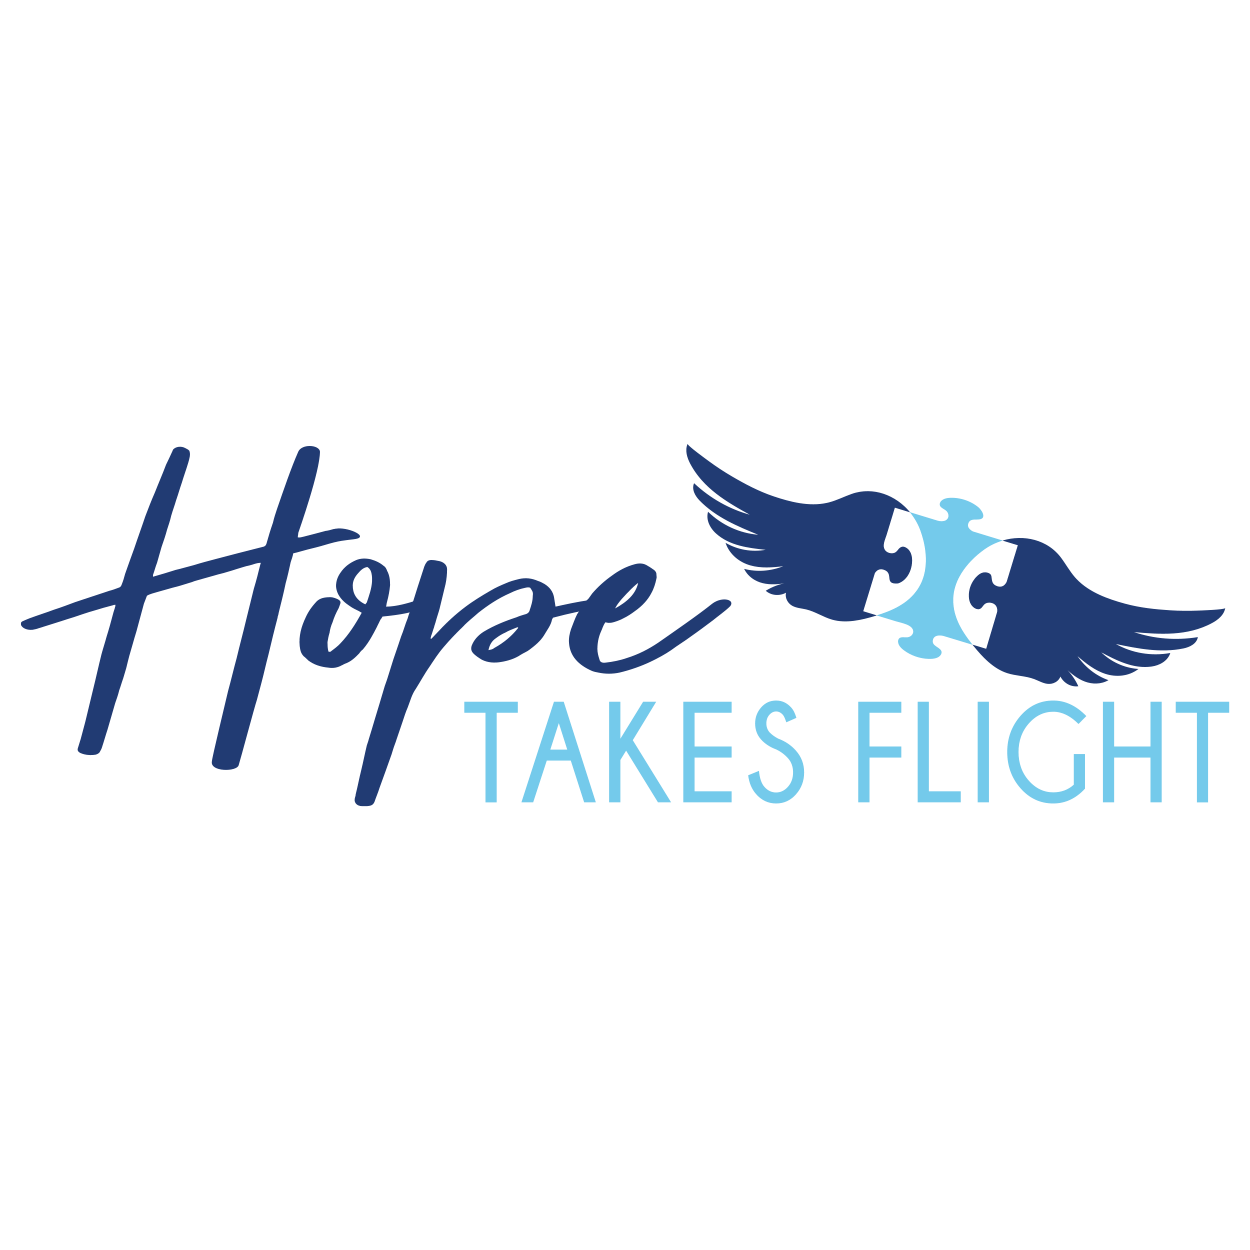 Hope Takes Flight - Williams Community School - Logo - CraftnDraft Inc